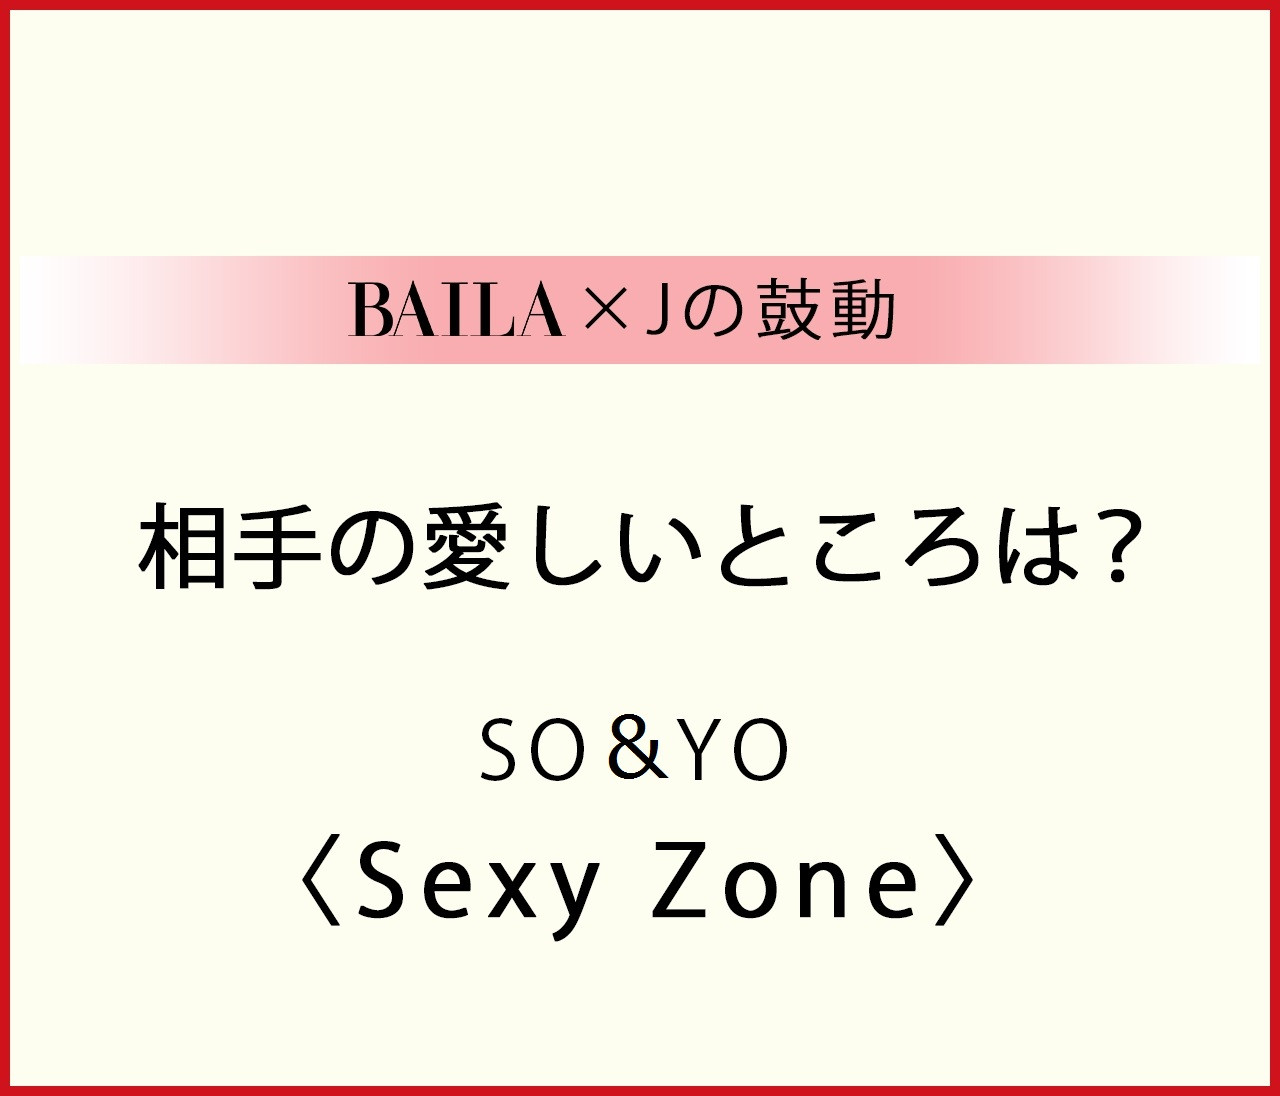 【Sexy Zone】松島聡&マリウス葉、相手の愛しいところは?【BAILA × Jの鼓動】